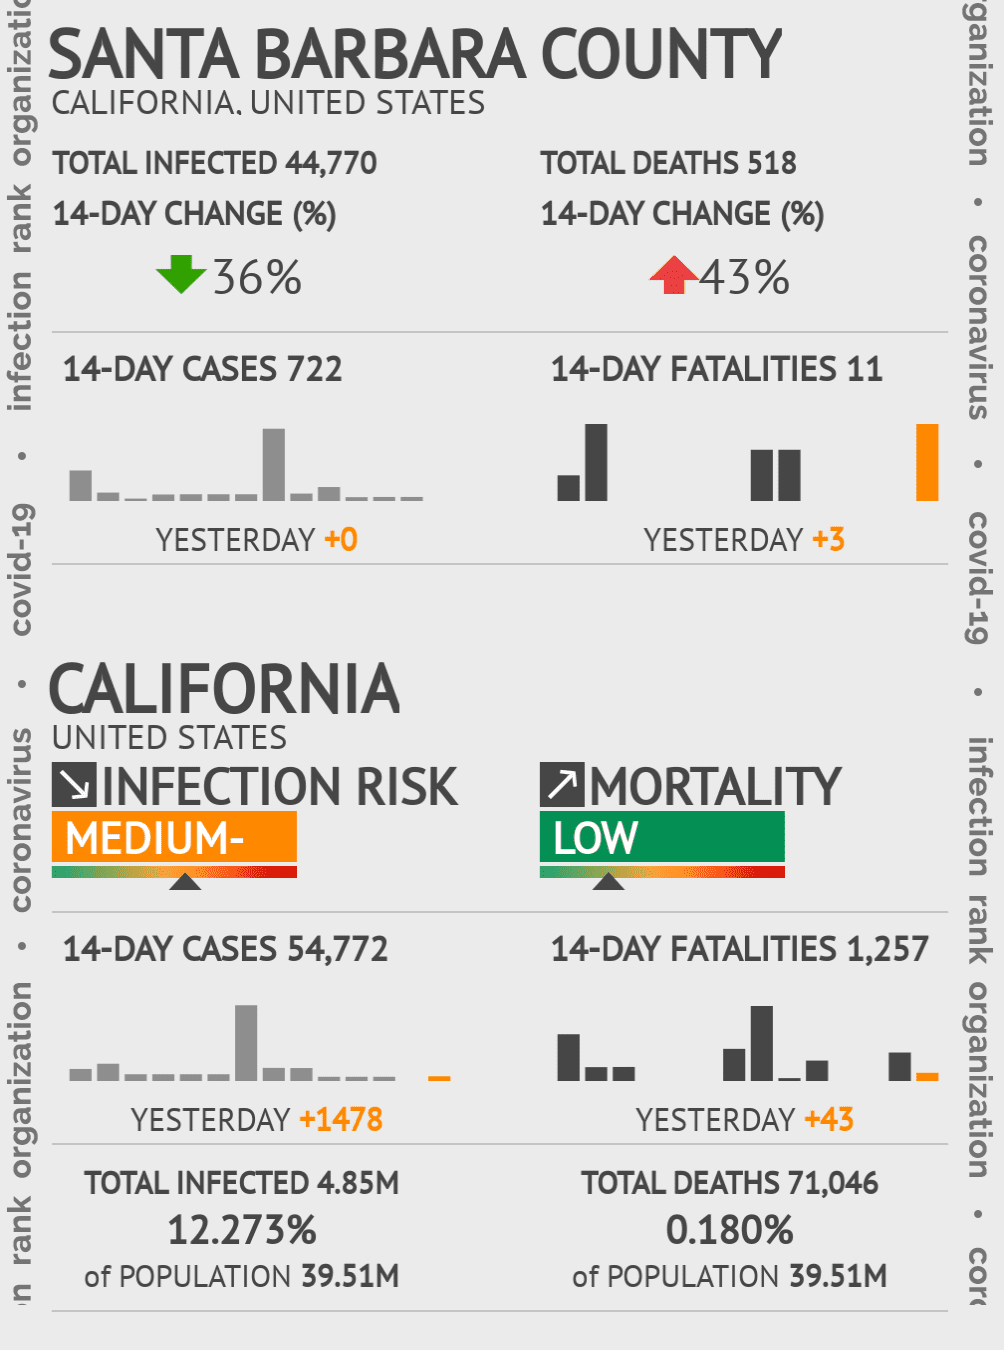 Santa Barbara County Coronavirus Covid-19 Risk of Infection on October 16, 2020